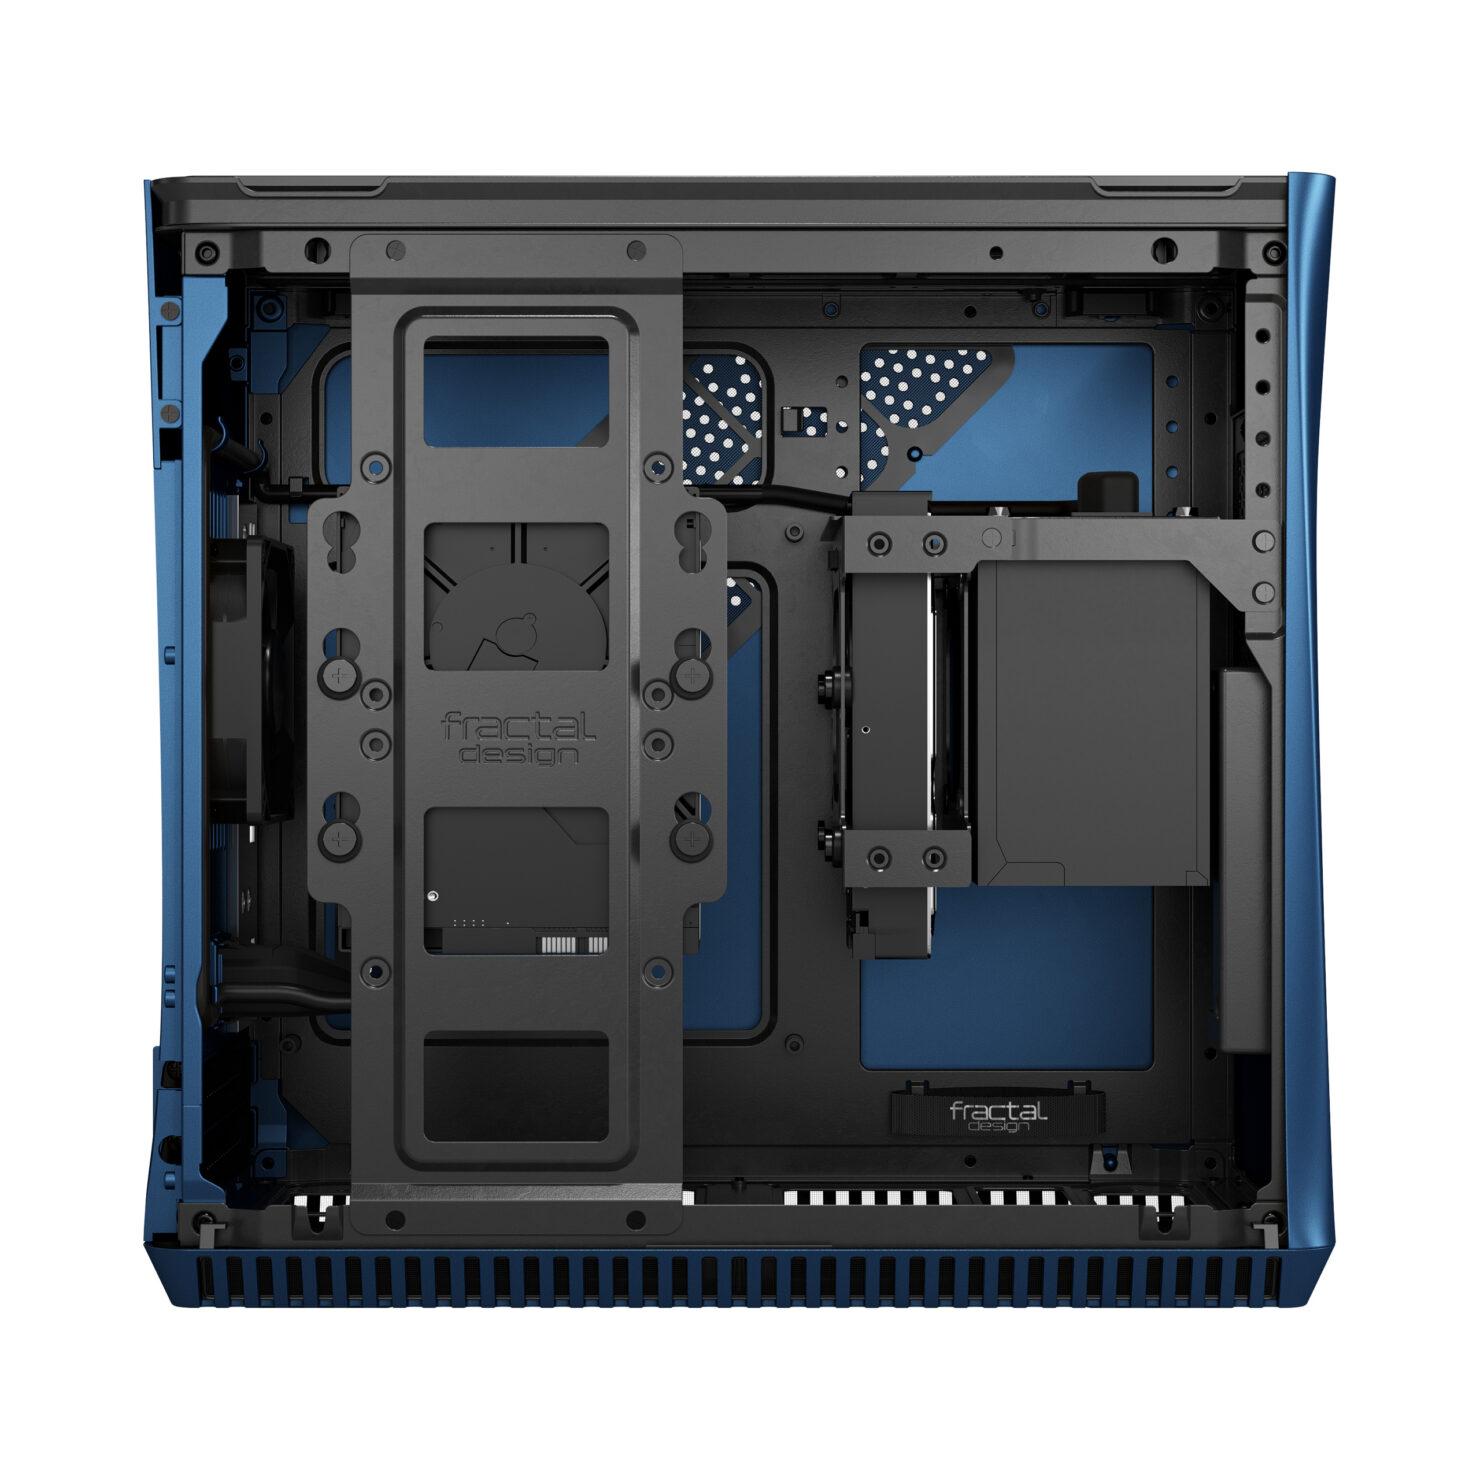 eraitx_side_sfx_hdd_product_blue